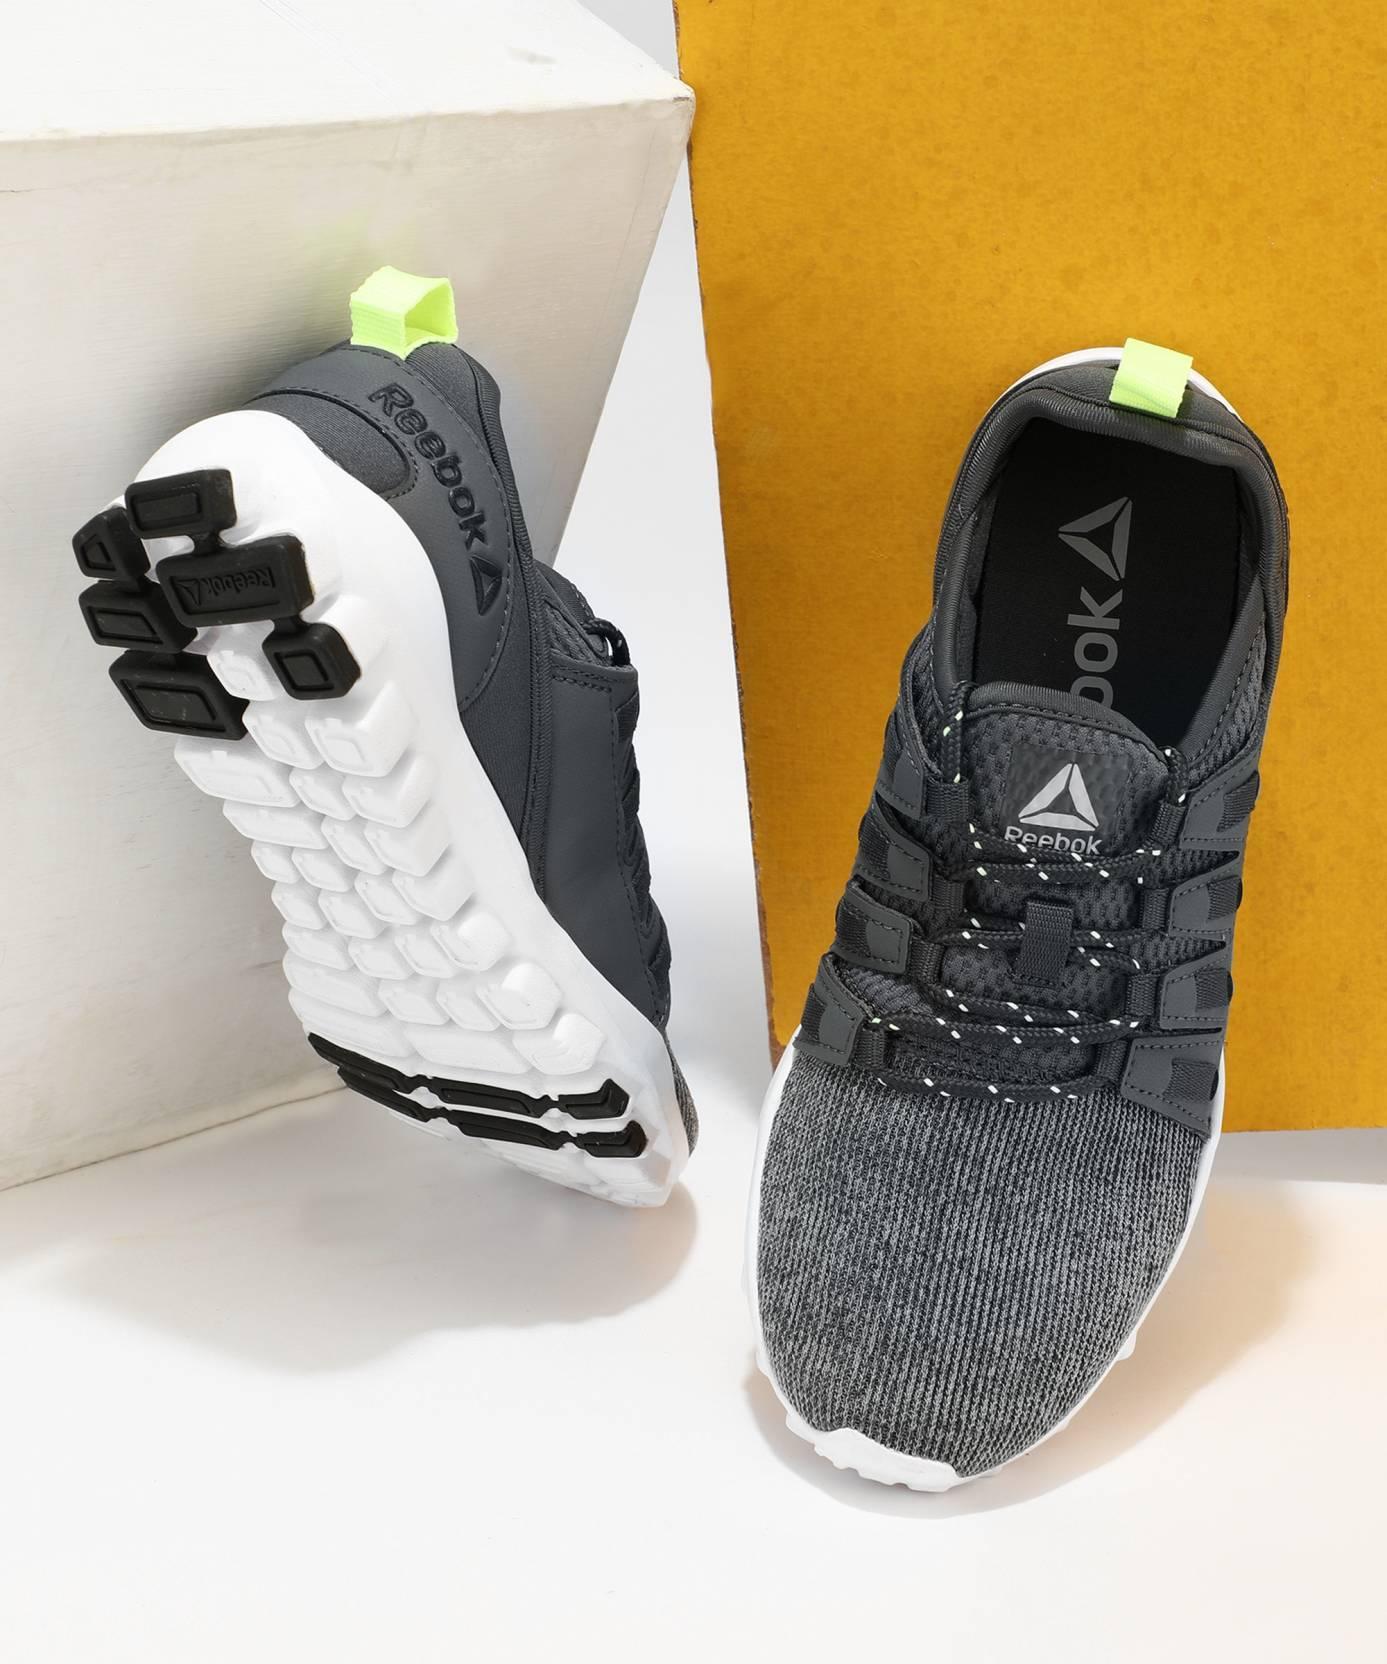 reebok shoes ka price